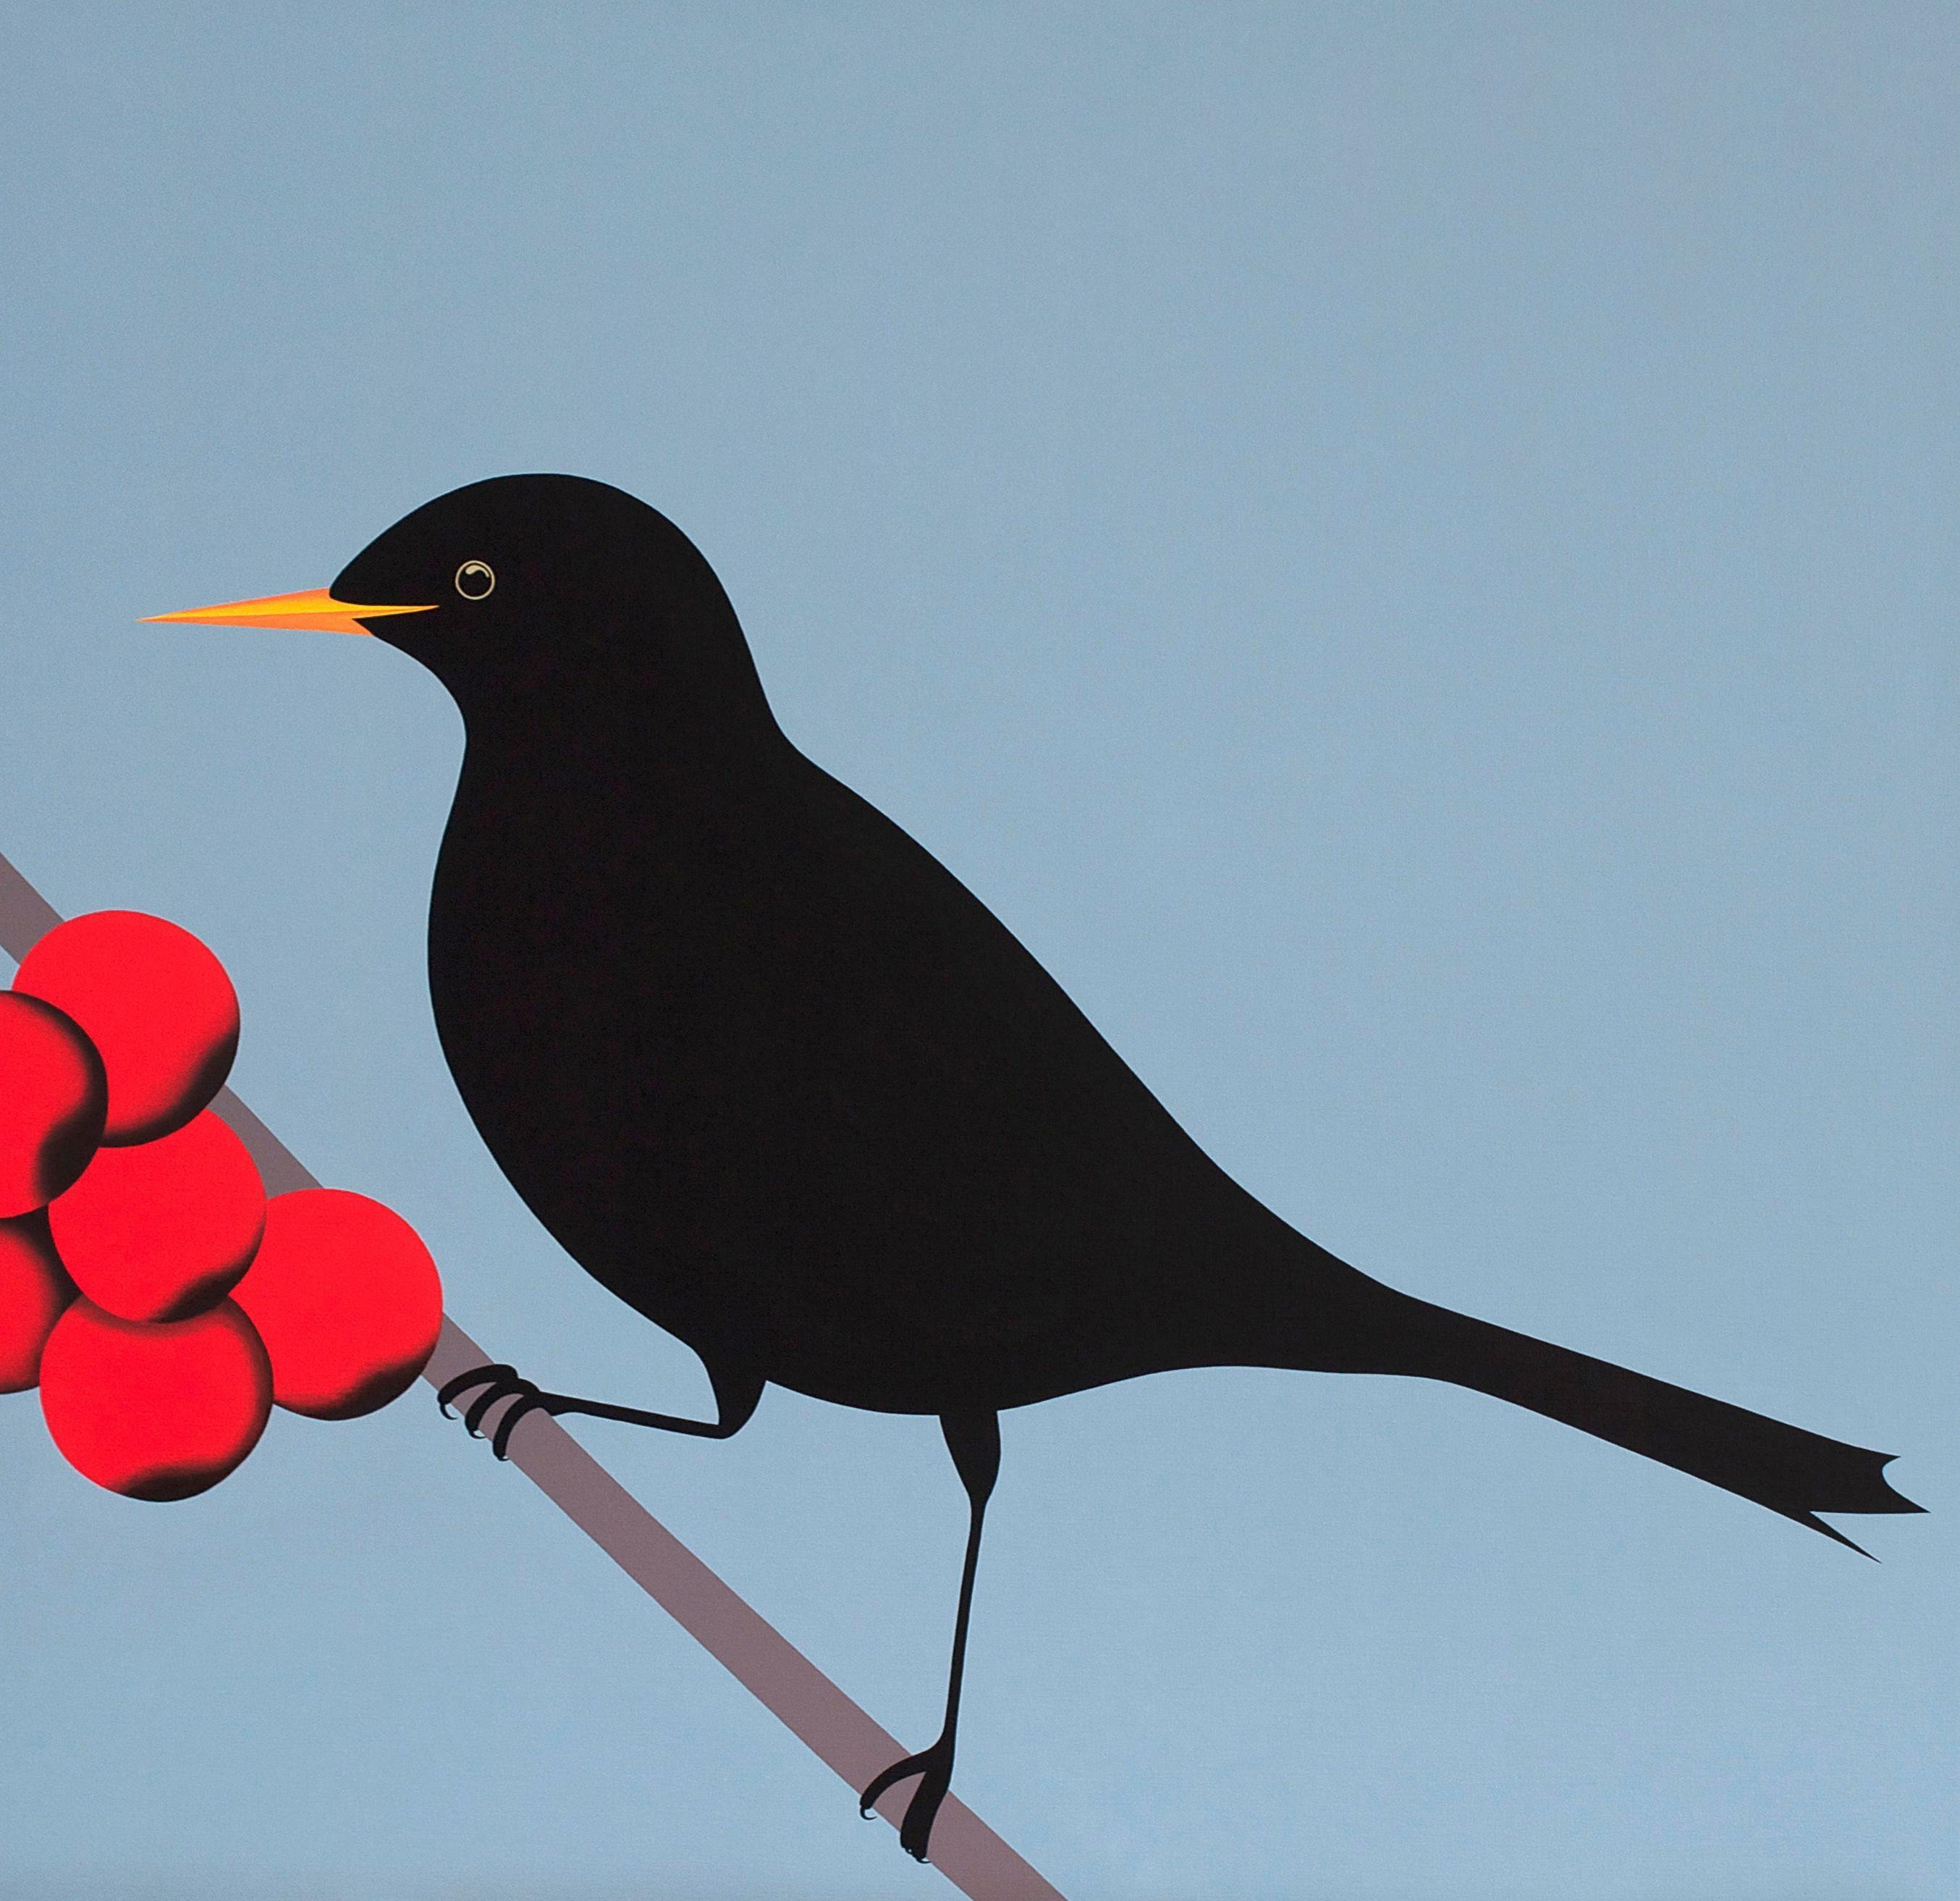 Black bird - figurative landscape painting